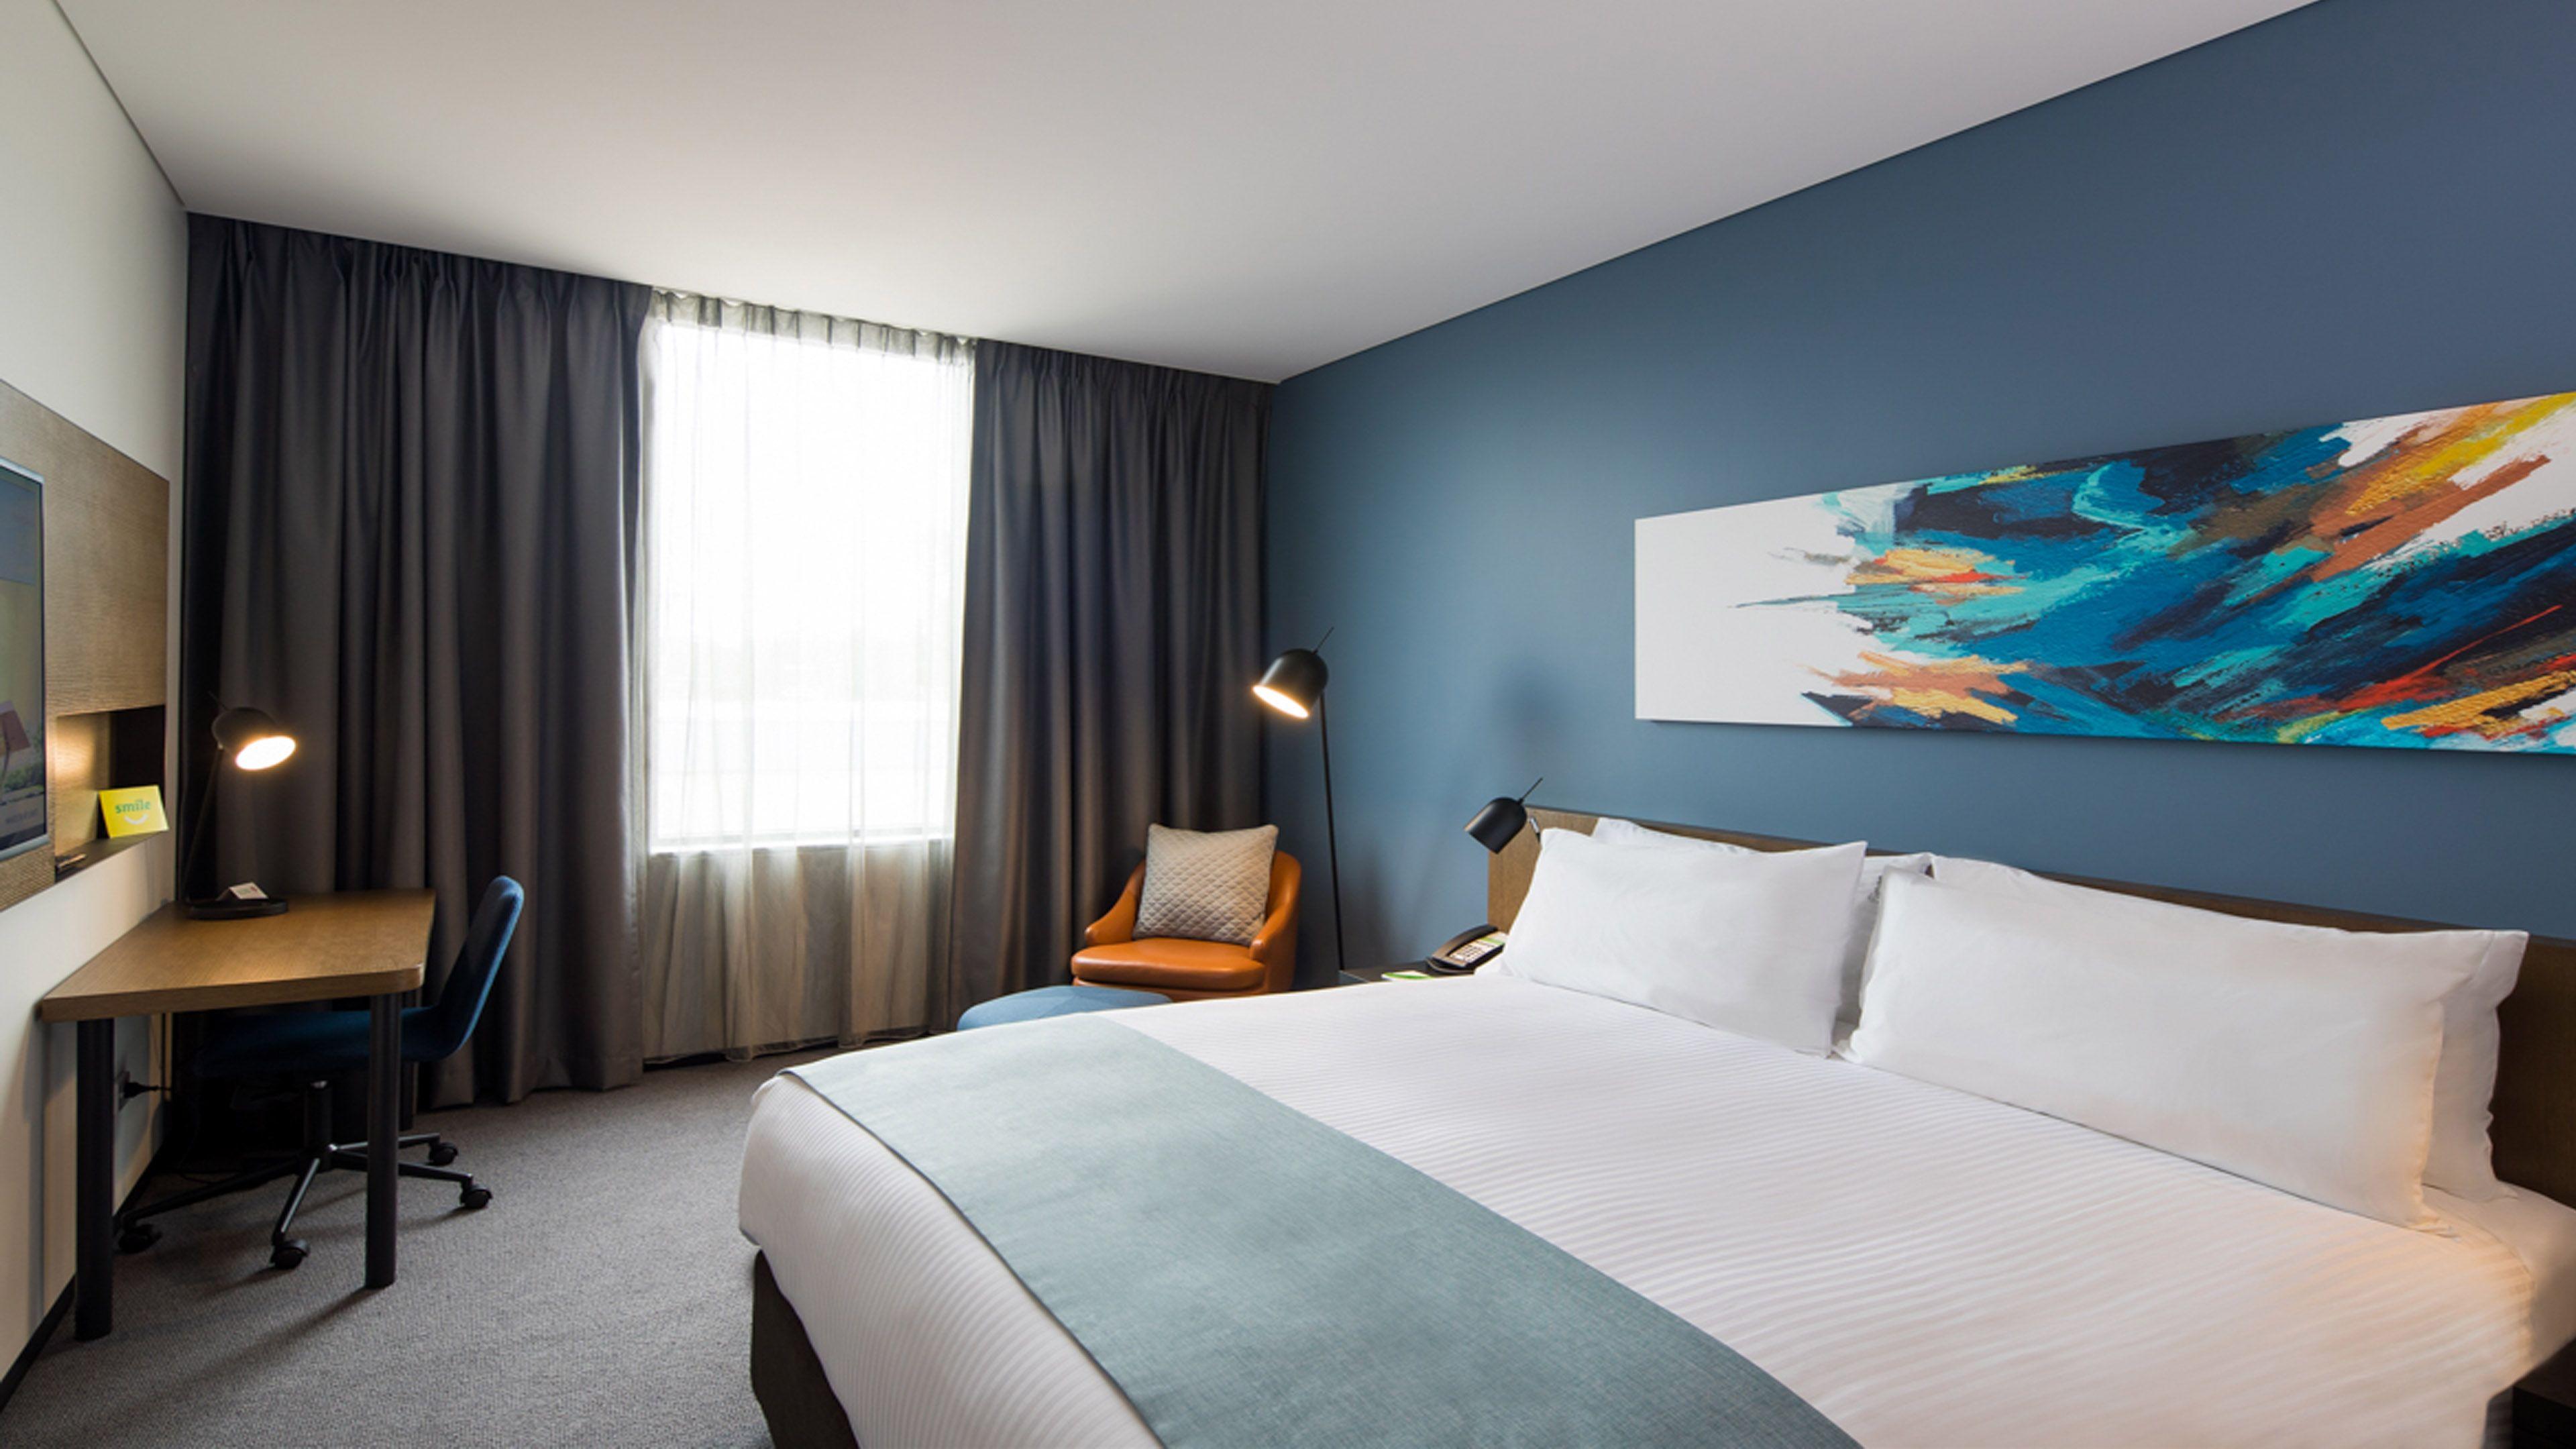 Holiday Inn Sydney St Marys Sydney (02) 9208 5678